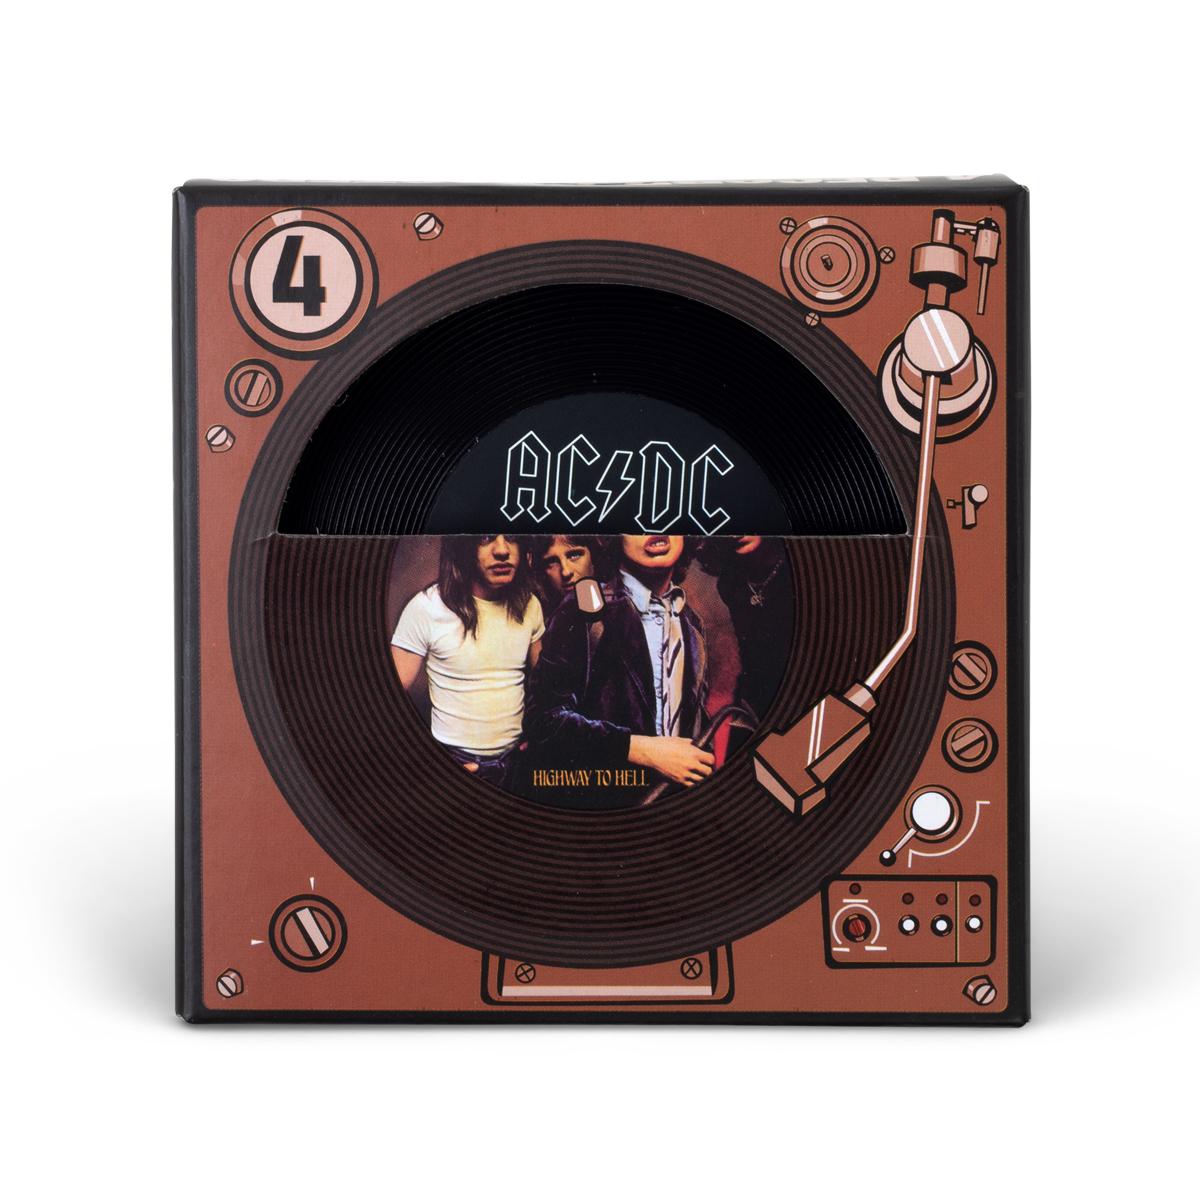 AC/DC Record Coaster Set